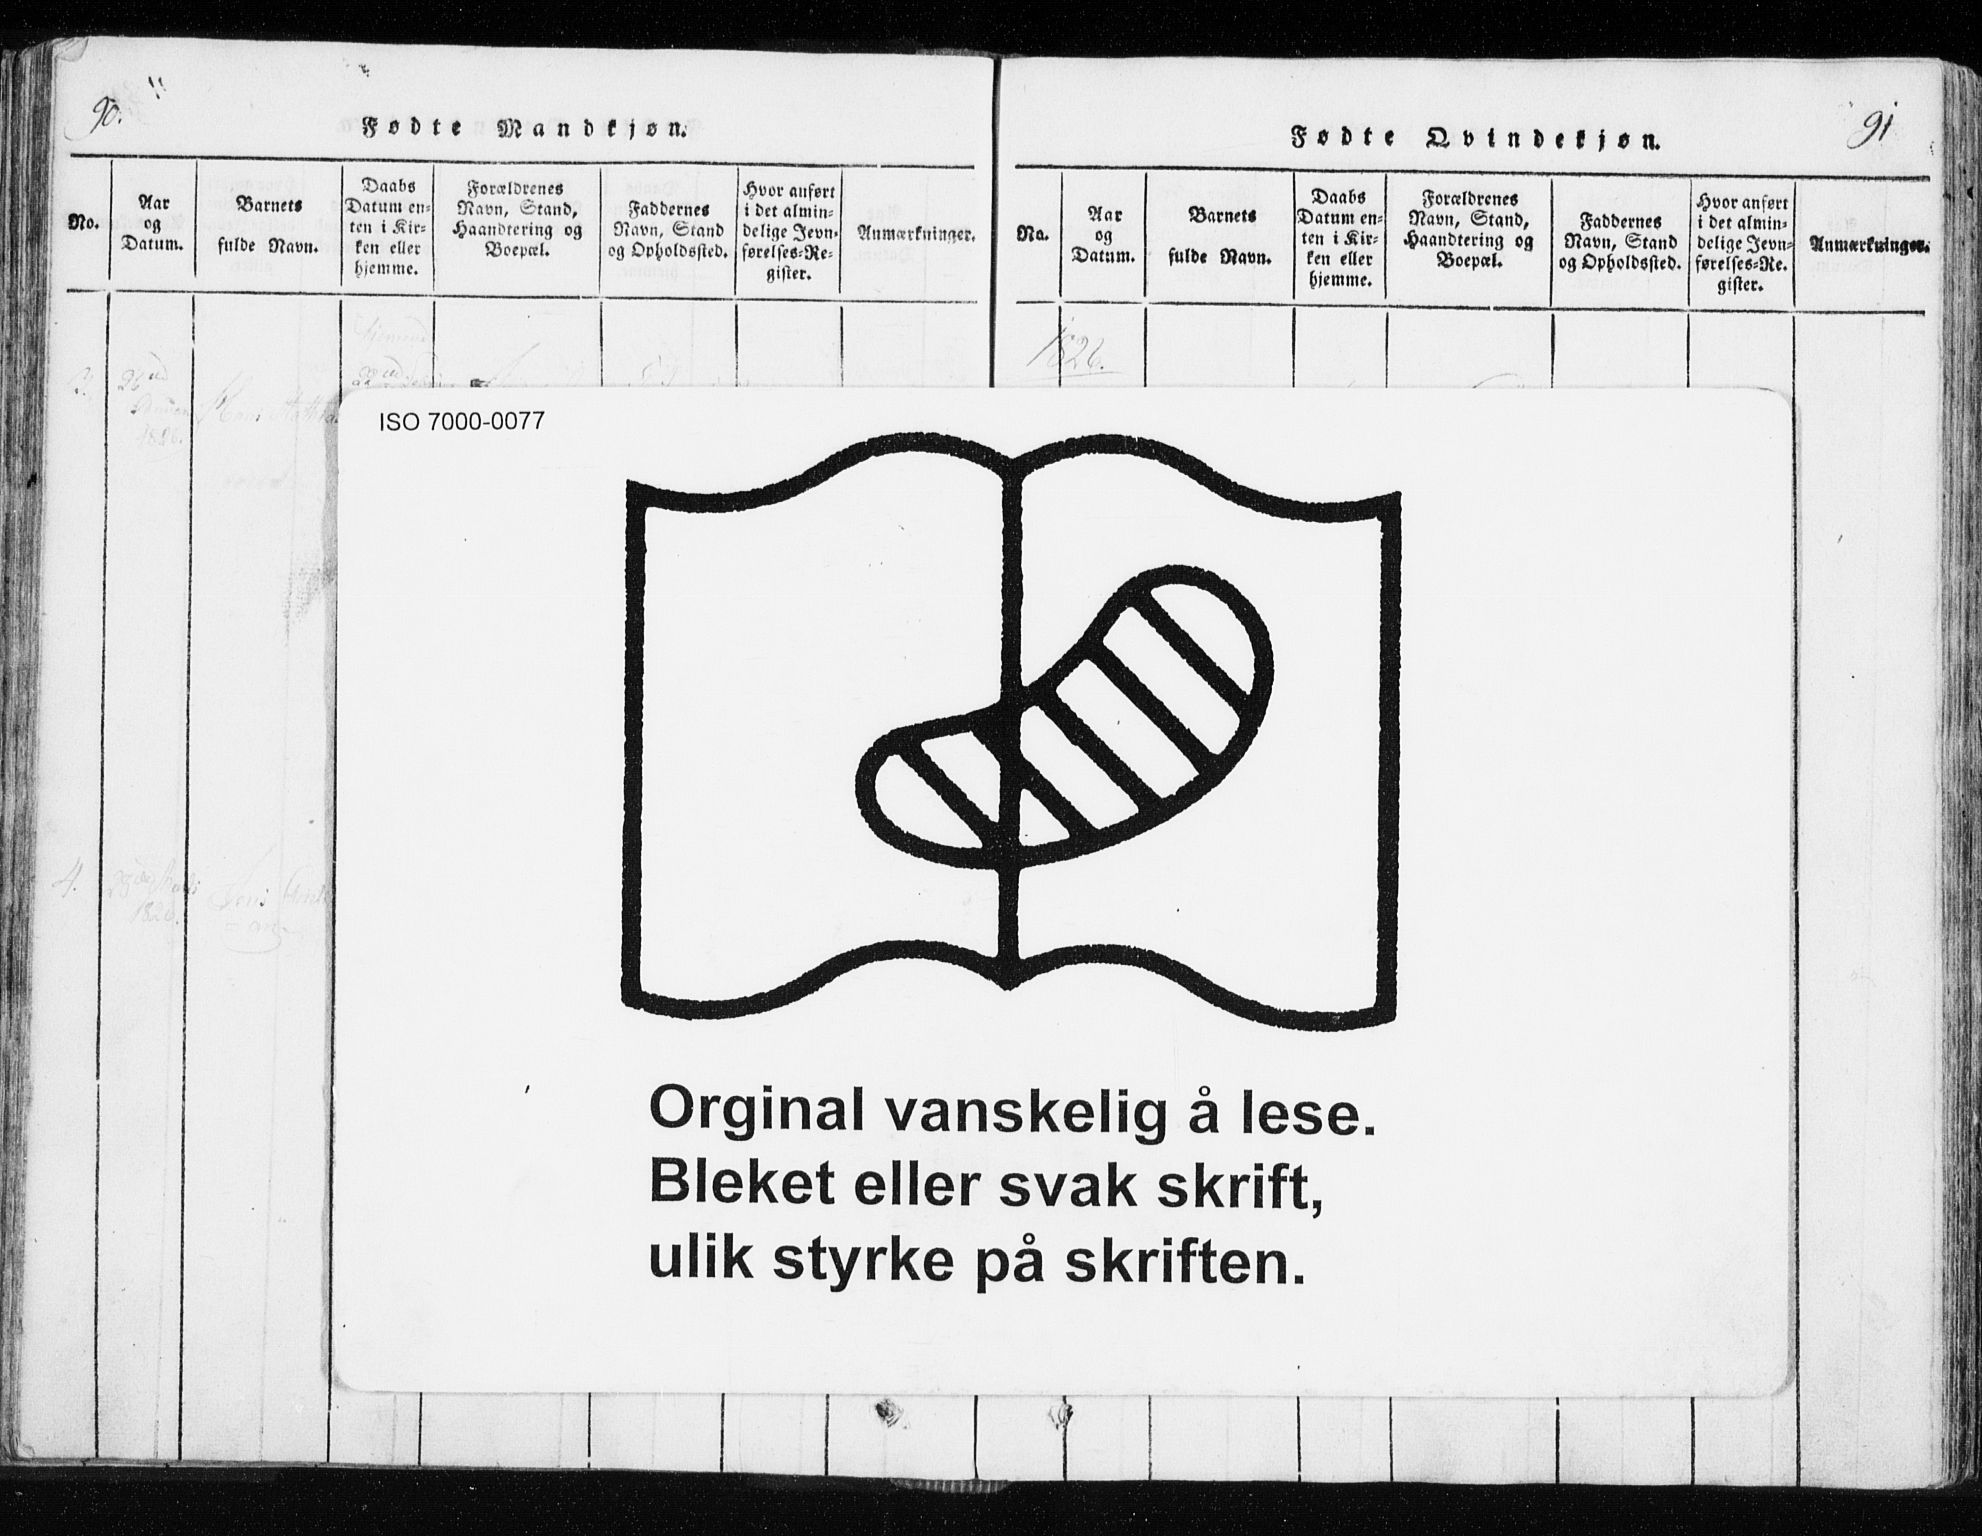 SATØ, Tranøy sokneprestkontor, I/Ia/Iaa/L0004kirke: Ministerialbok nr. 4, 1820-1829, s. 90-91